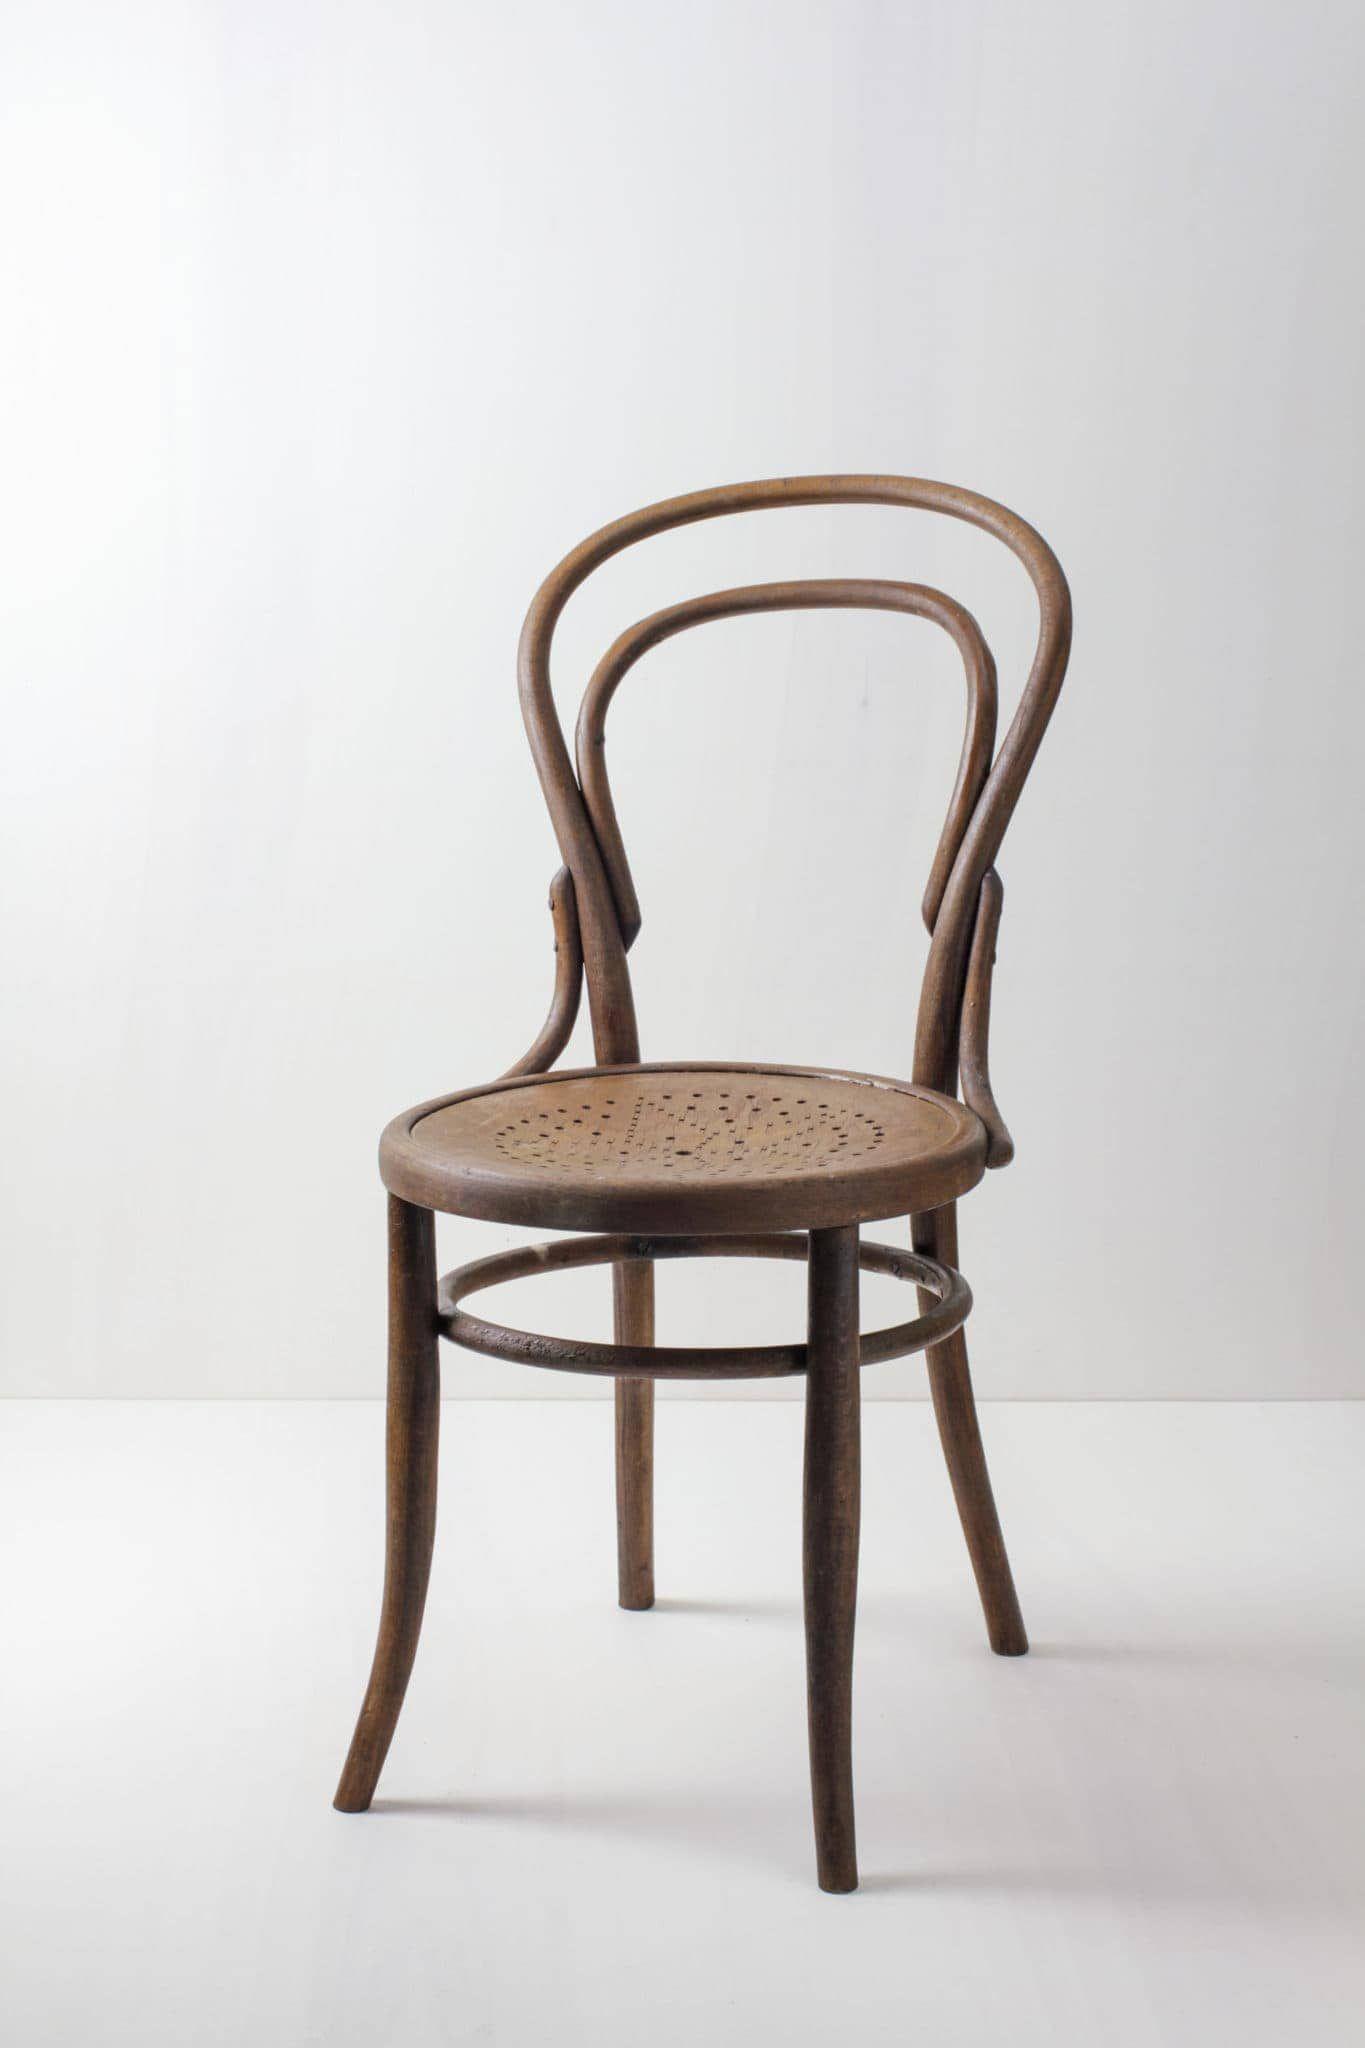 Thonet Stuhl Angel Gotvintage Rental Event Design Thonet Stuhle Stuhle Holzstuhle